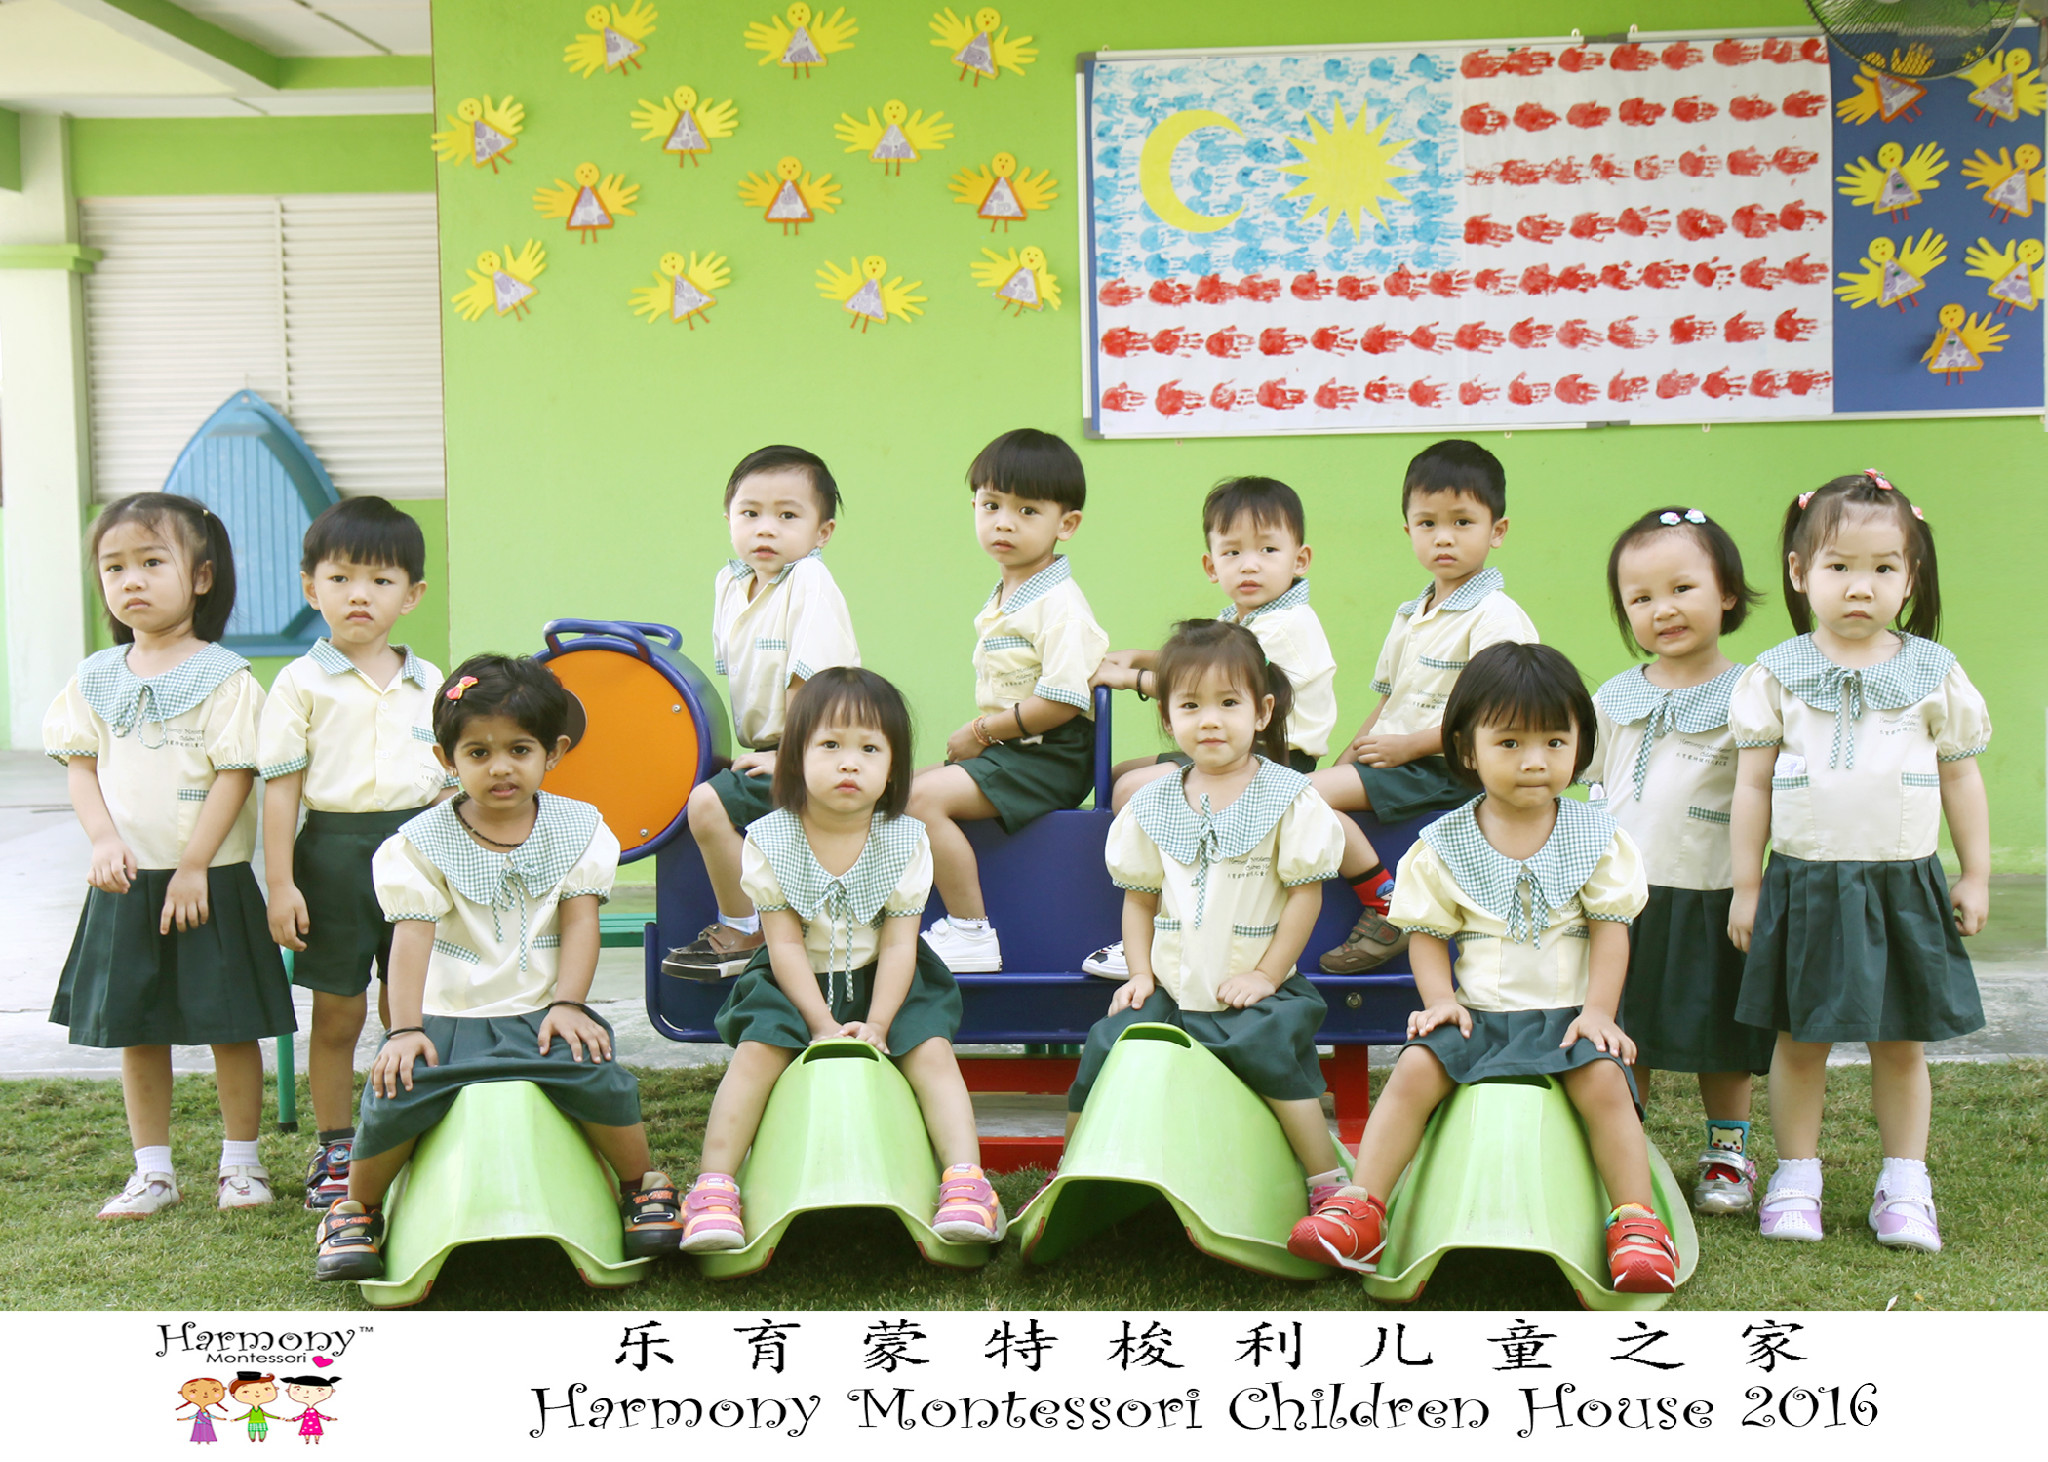 Harmony Montessori Children House Tadika Ria Harmoni